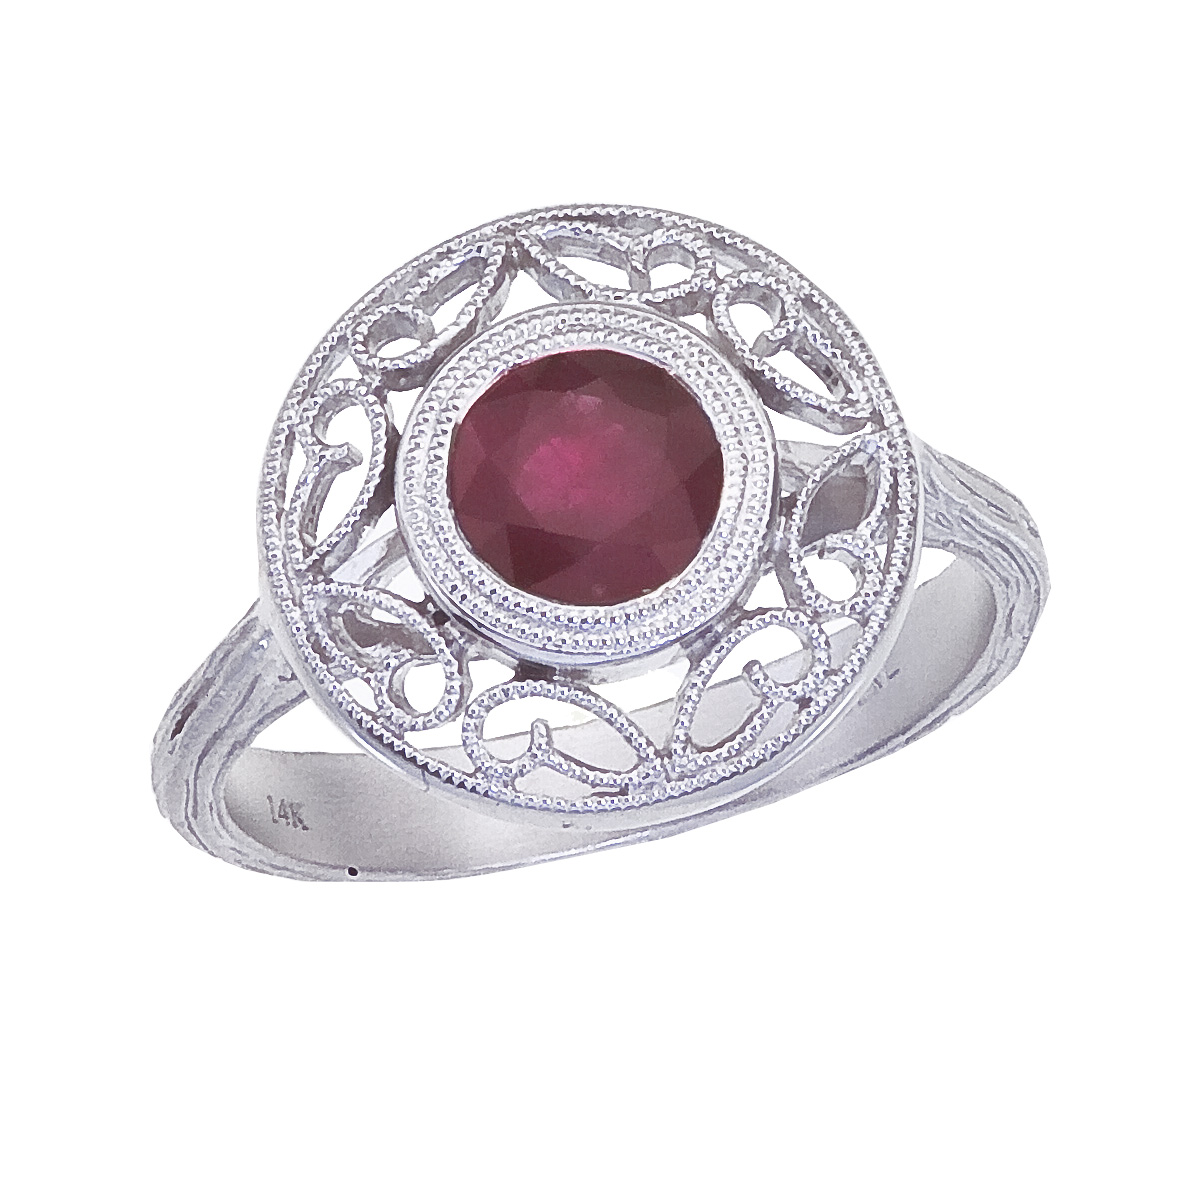 14k White Gold Ruby Filigree Ring by